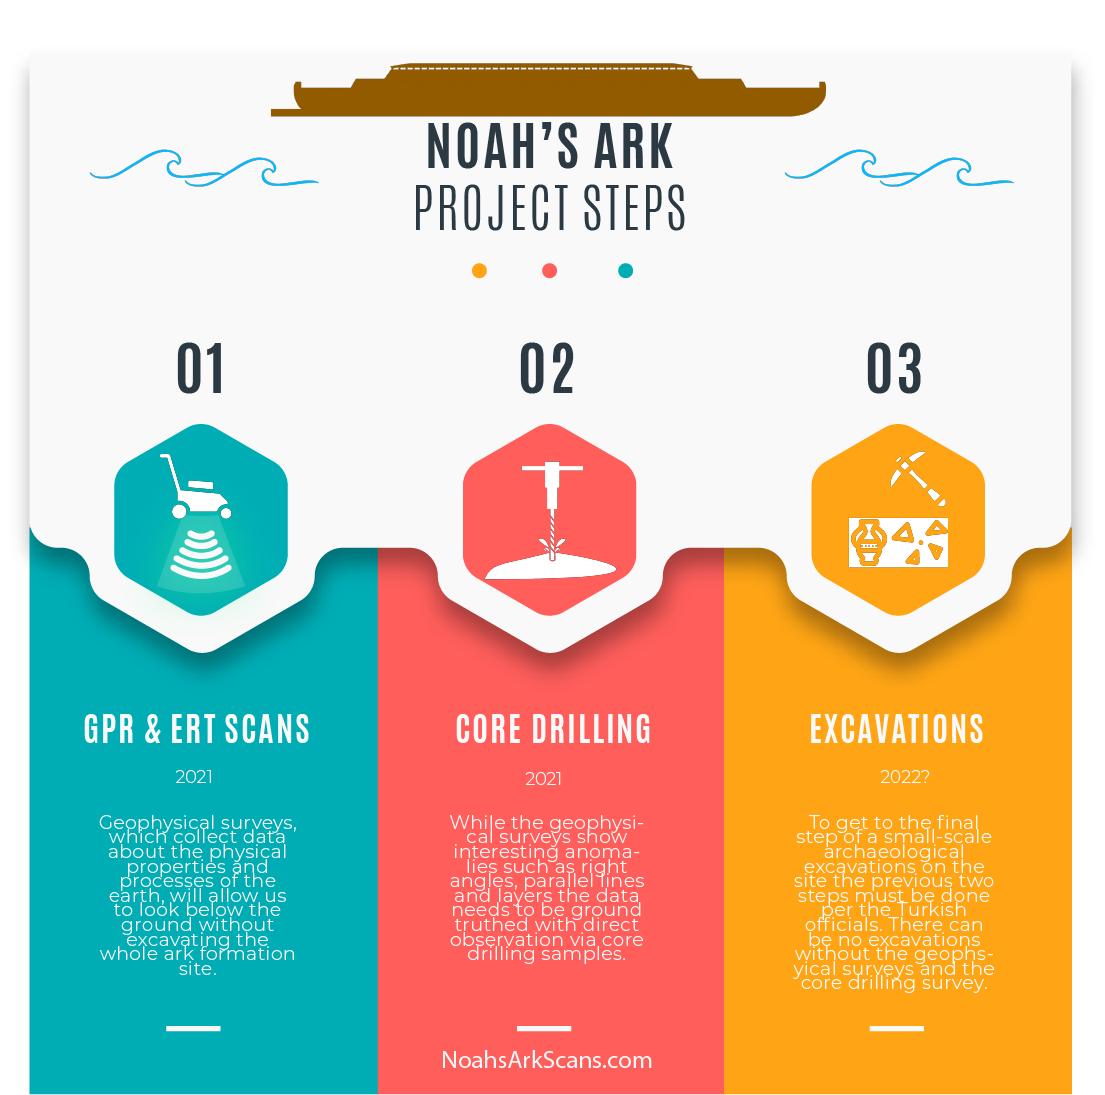 Noah's ark project steps